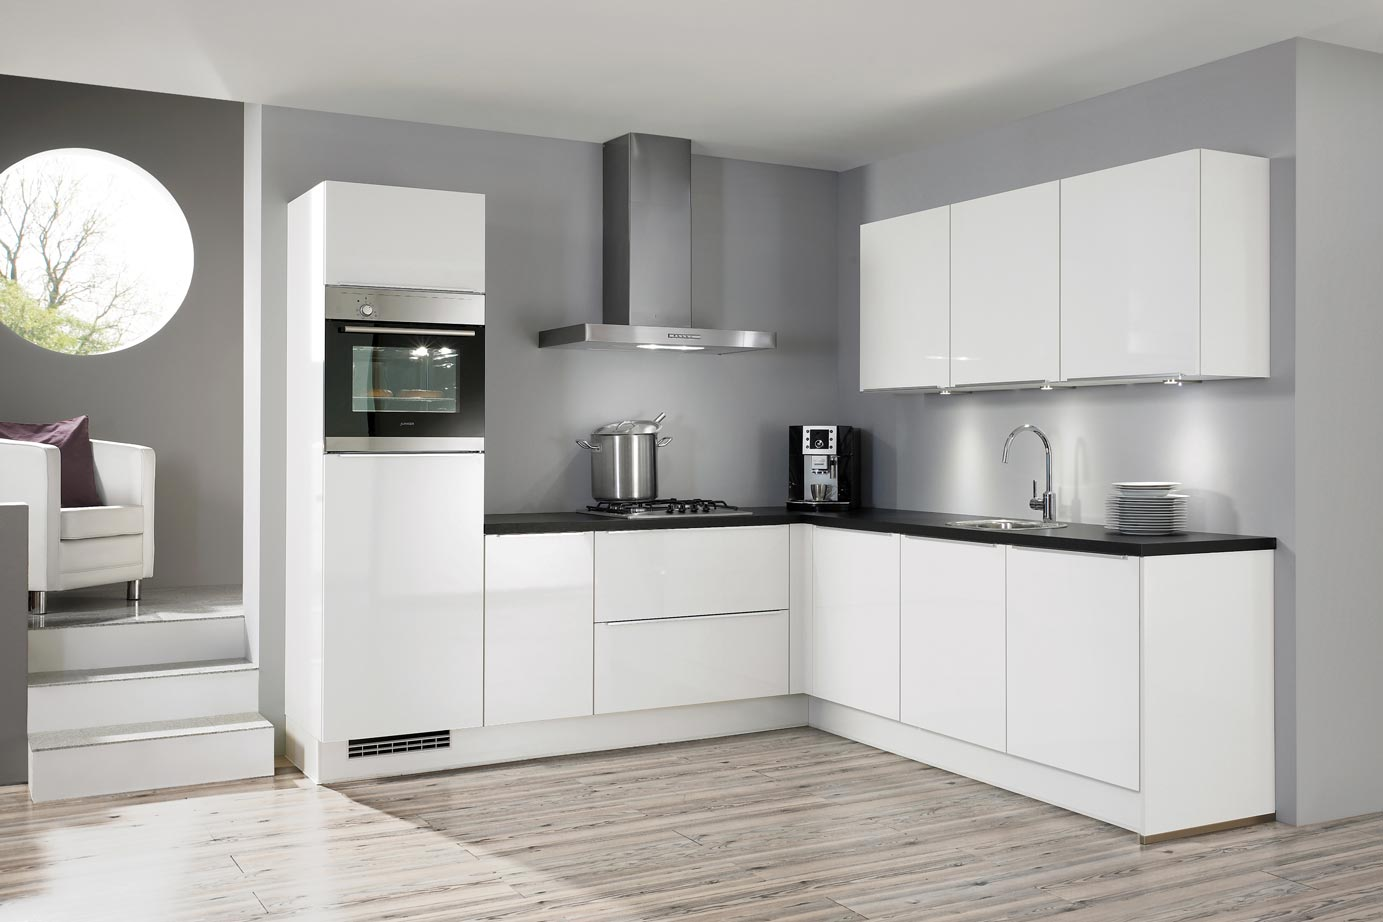 Greeploze Keuken Magnolia : Hoogglans Keuken Moderne Keukens Pictures to pin on Pinterest